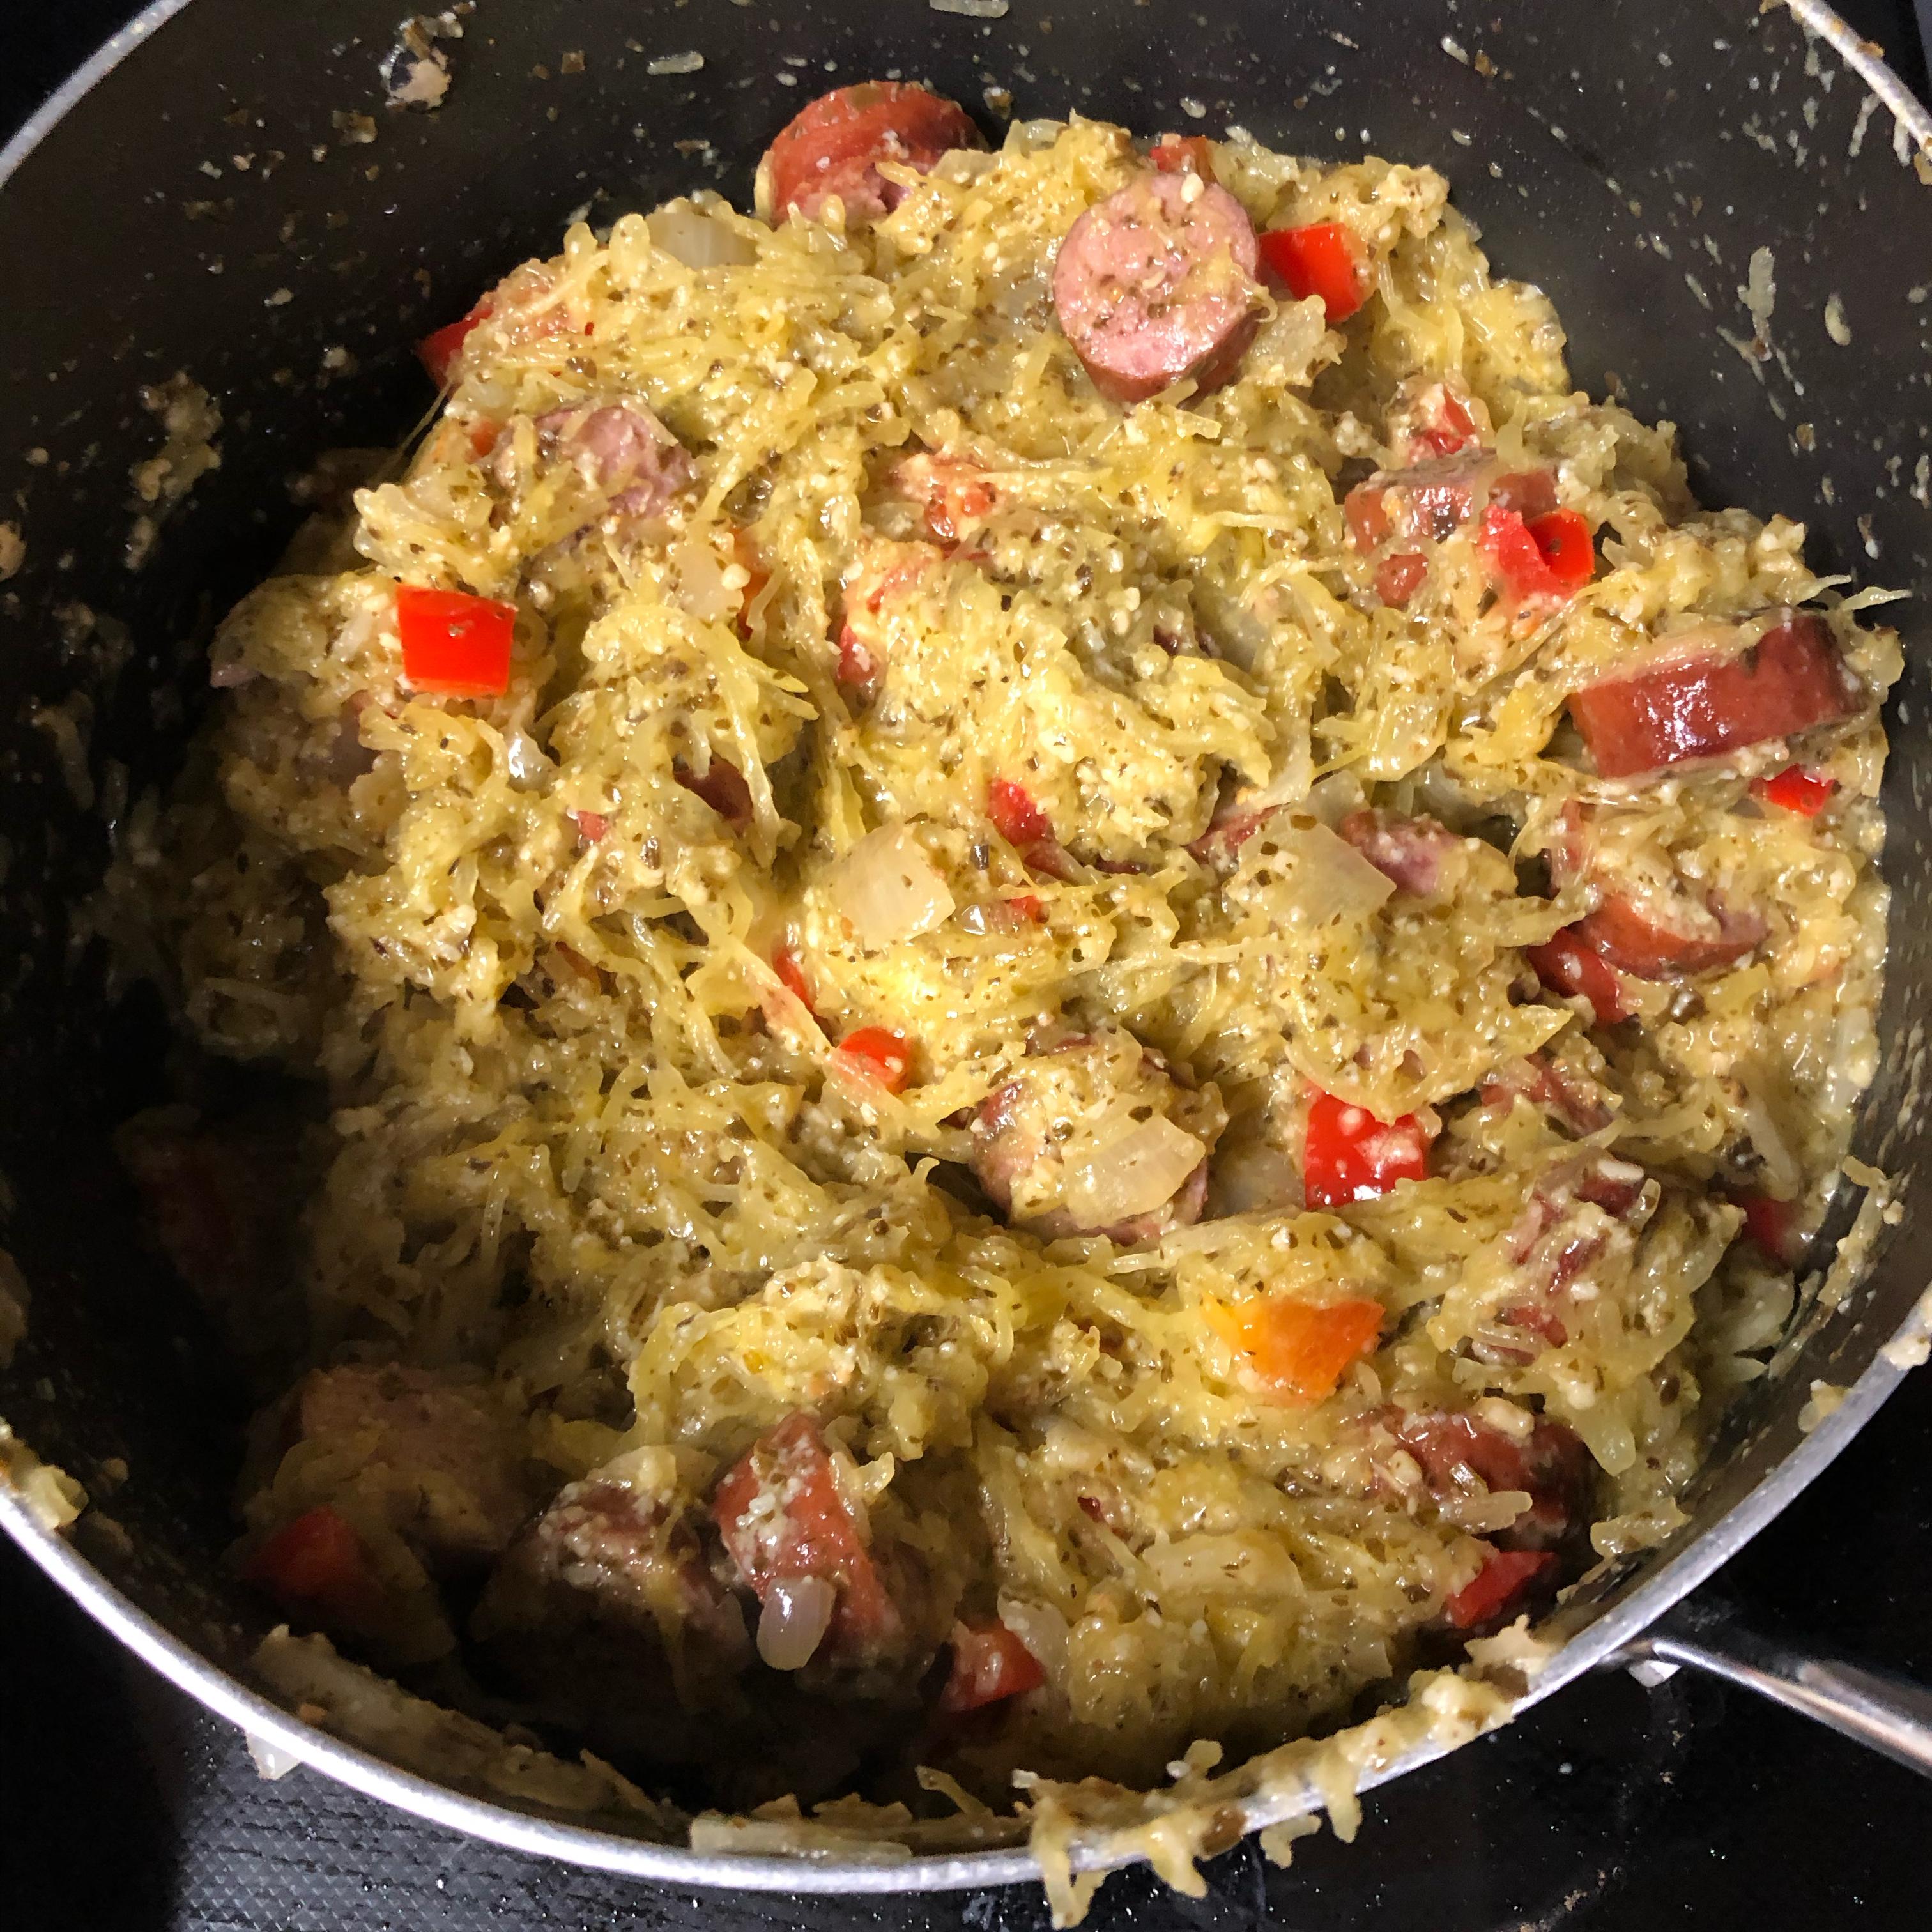 Pesto Spaghetti Squash Skillet with Hillshire Farm® Smoked Sausage Amanda Hecker